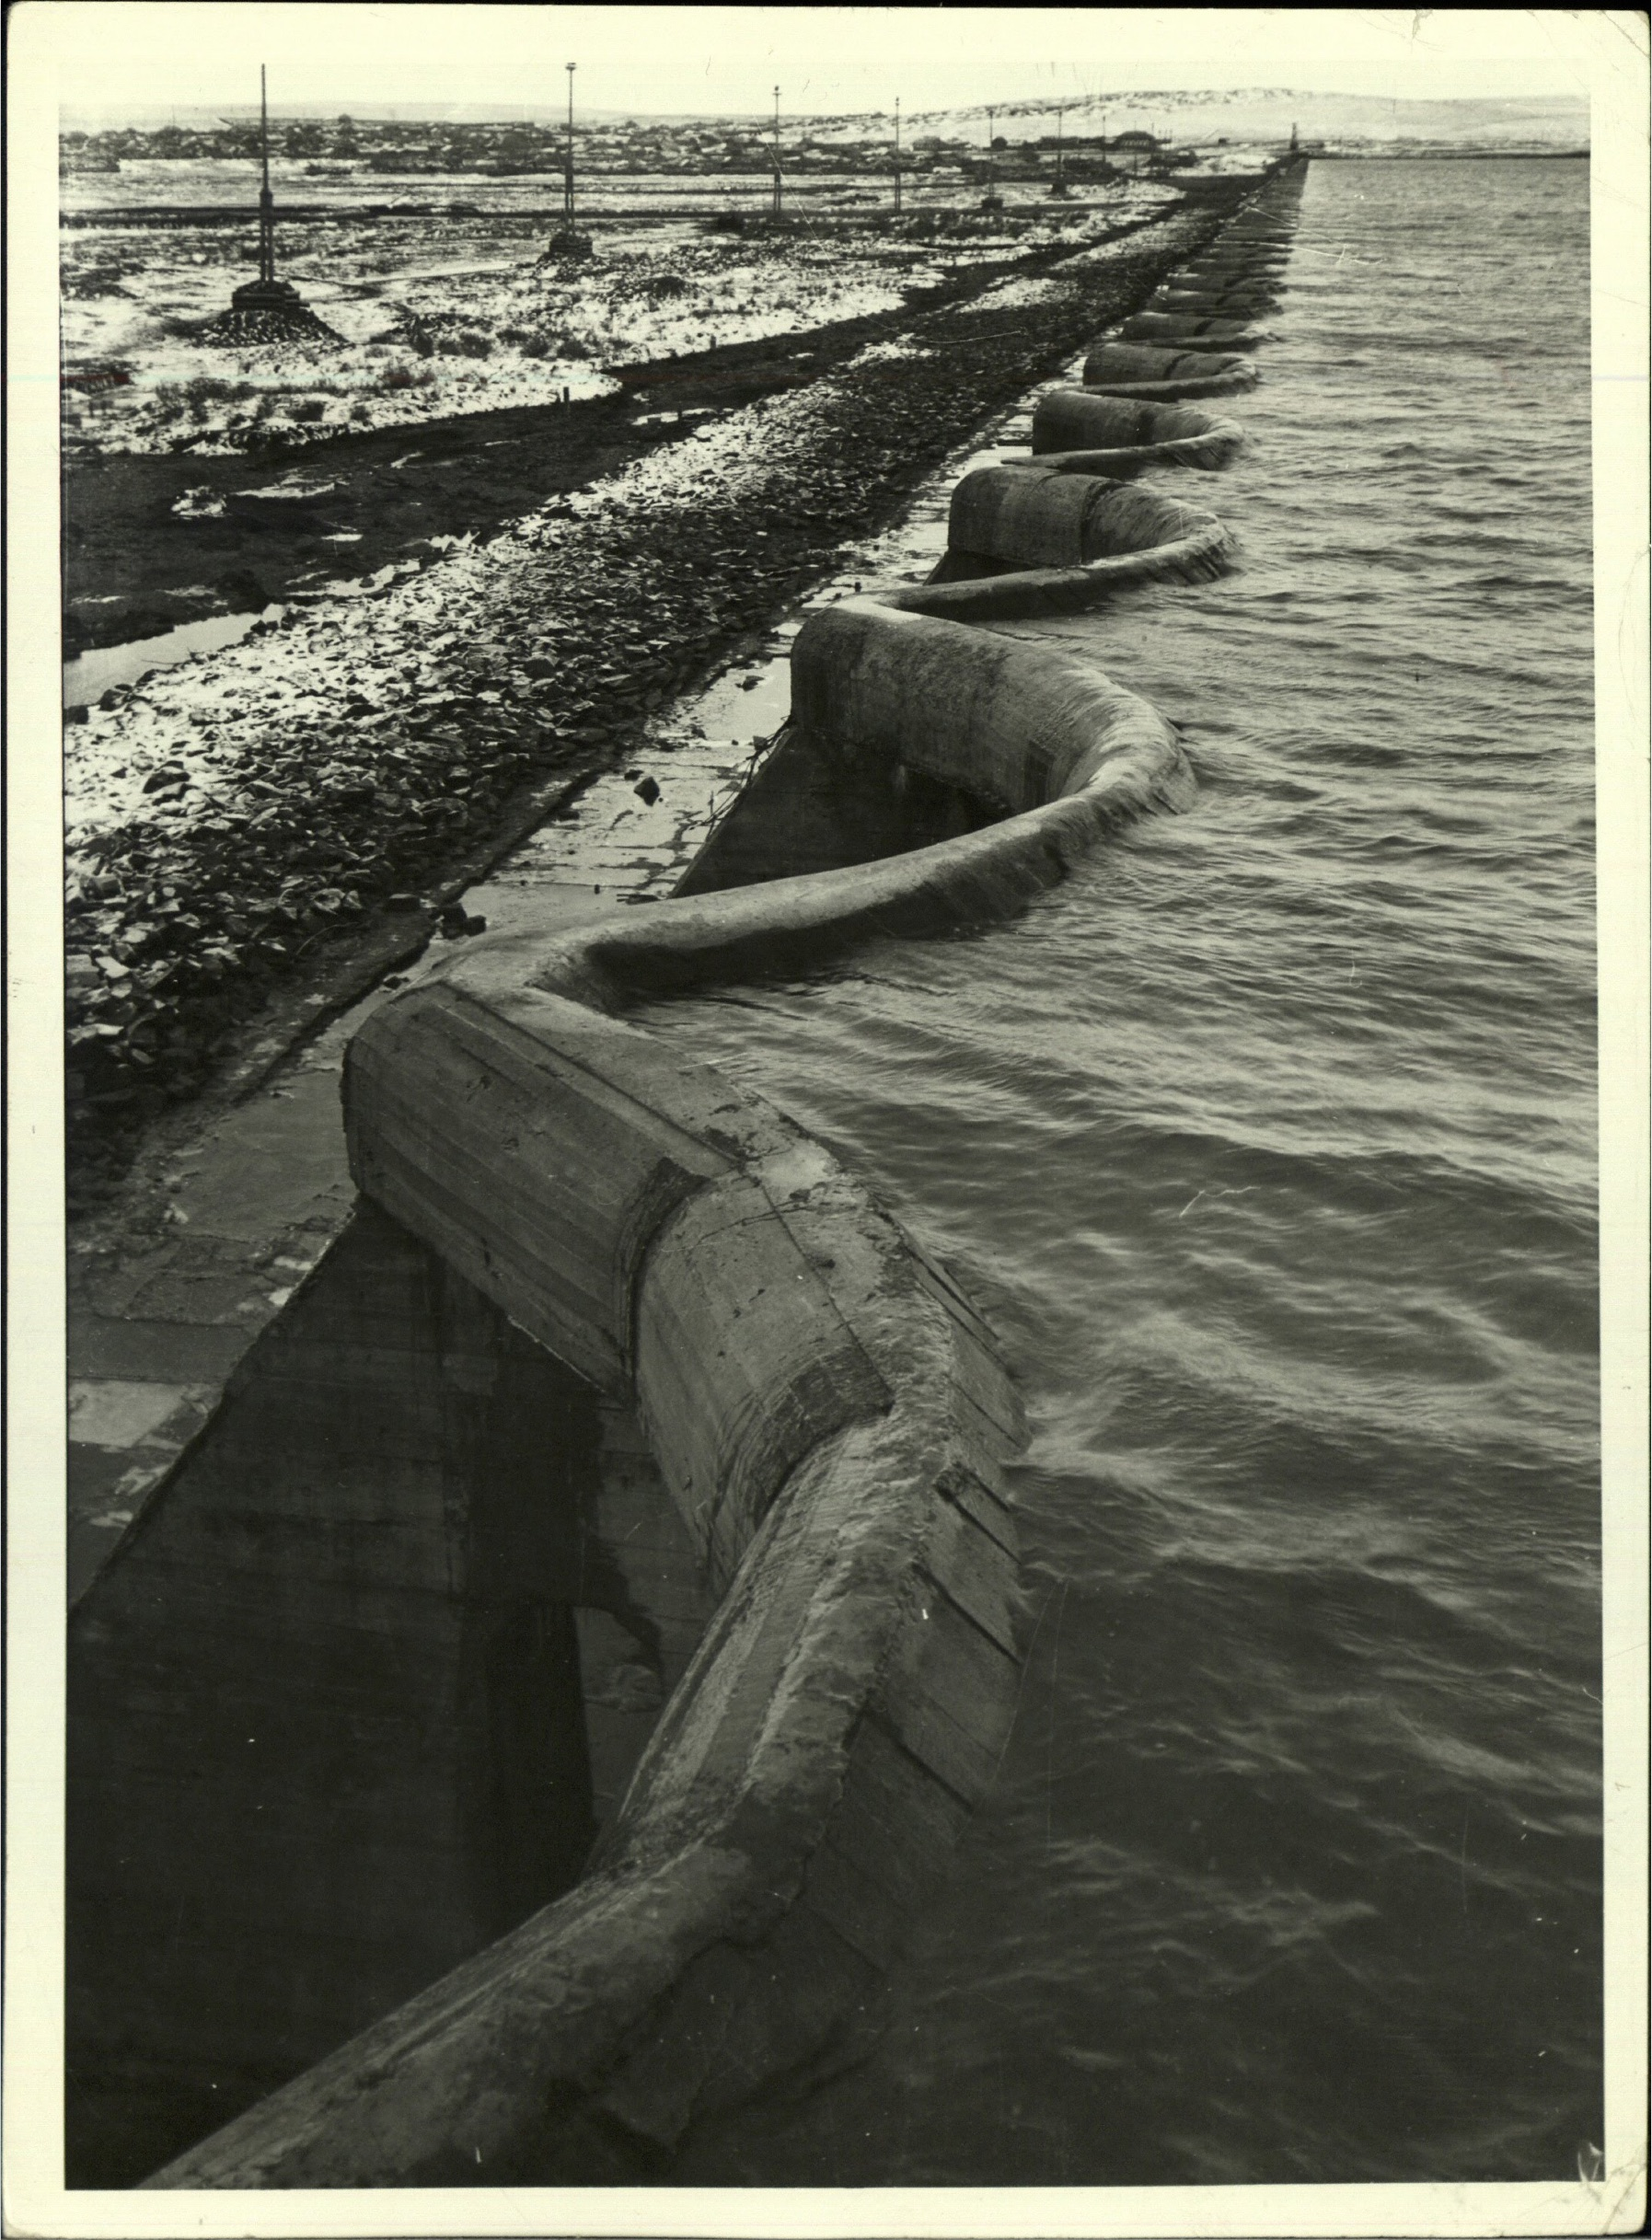 Margaret Bourke-White, Concrete dam-like breakwater on lake (Magnitogorsk, 1931)